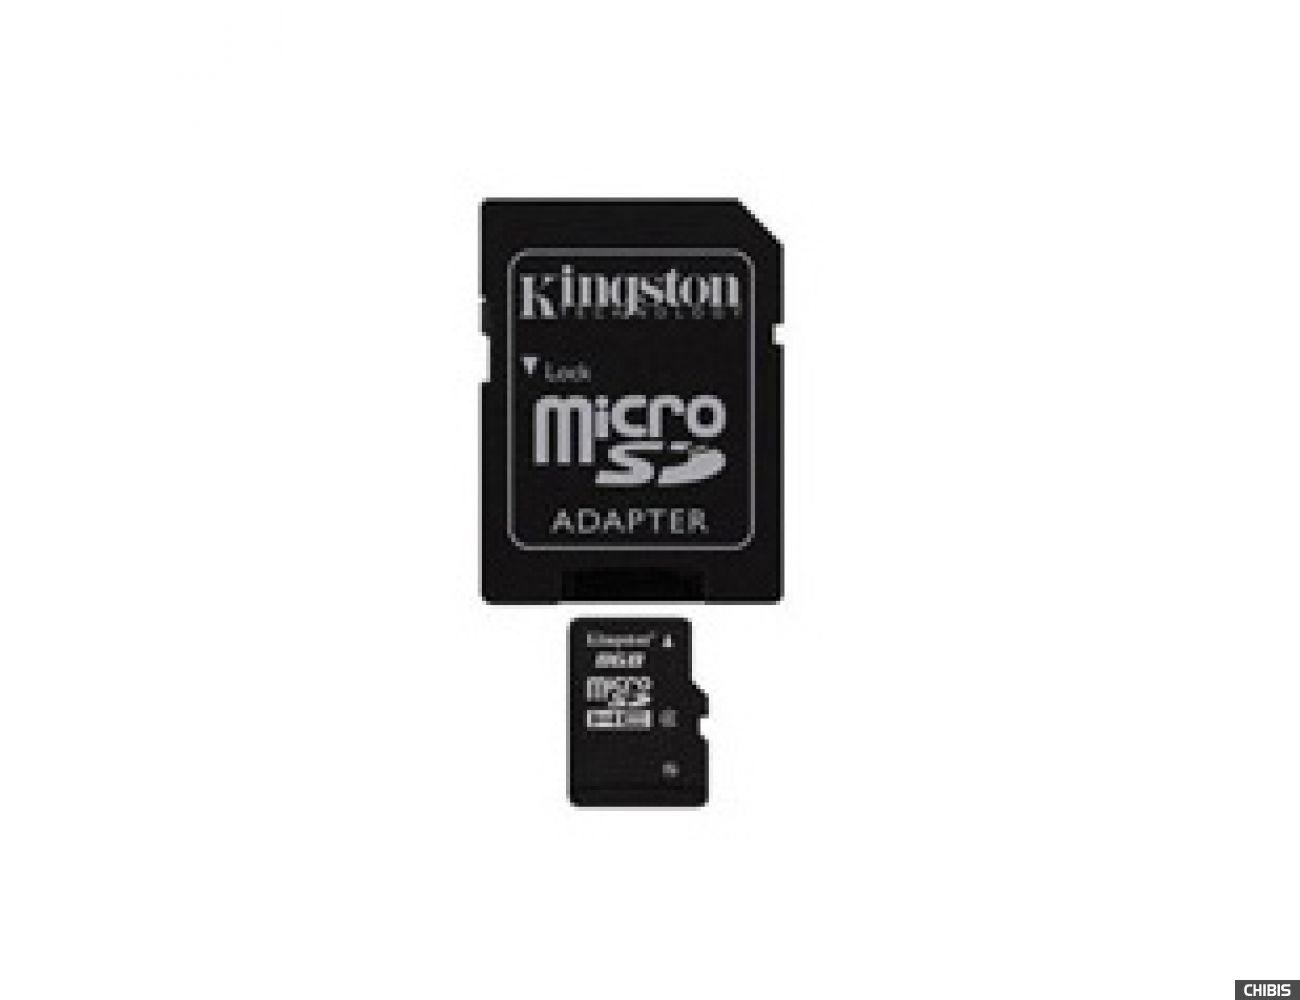 Карта памяти Kingston MicroSDHC 8 GB Class 4 + SD adapter